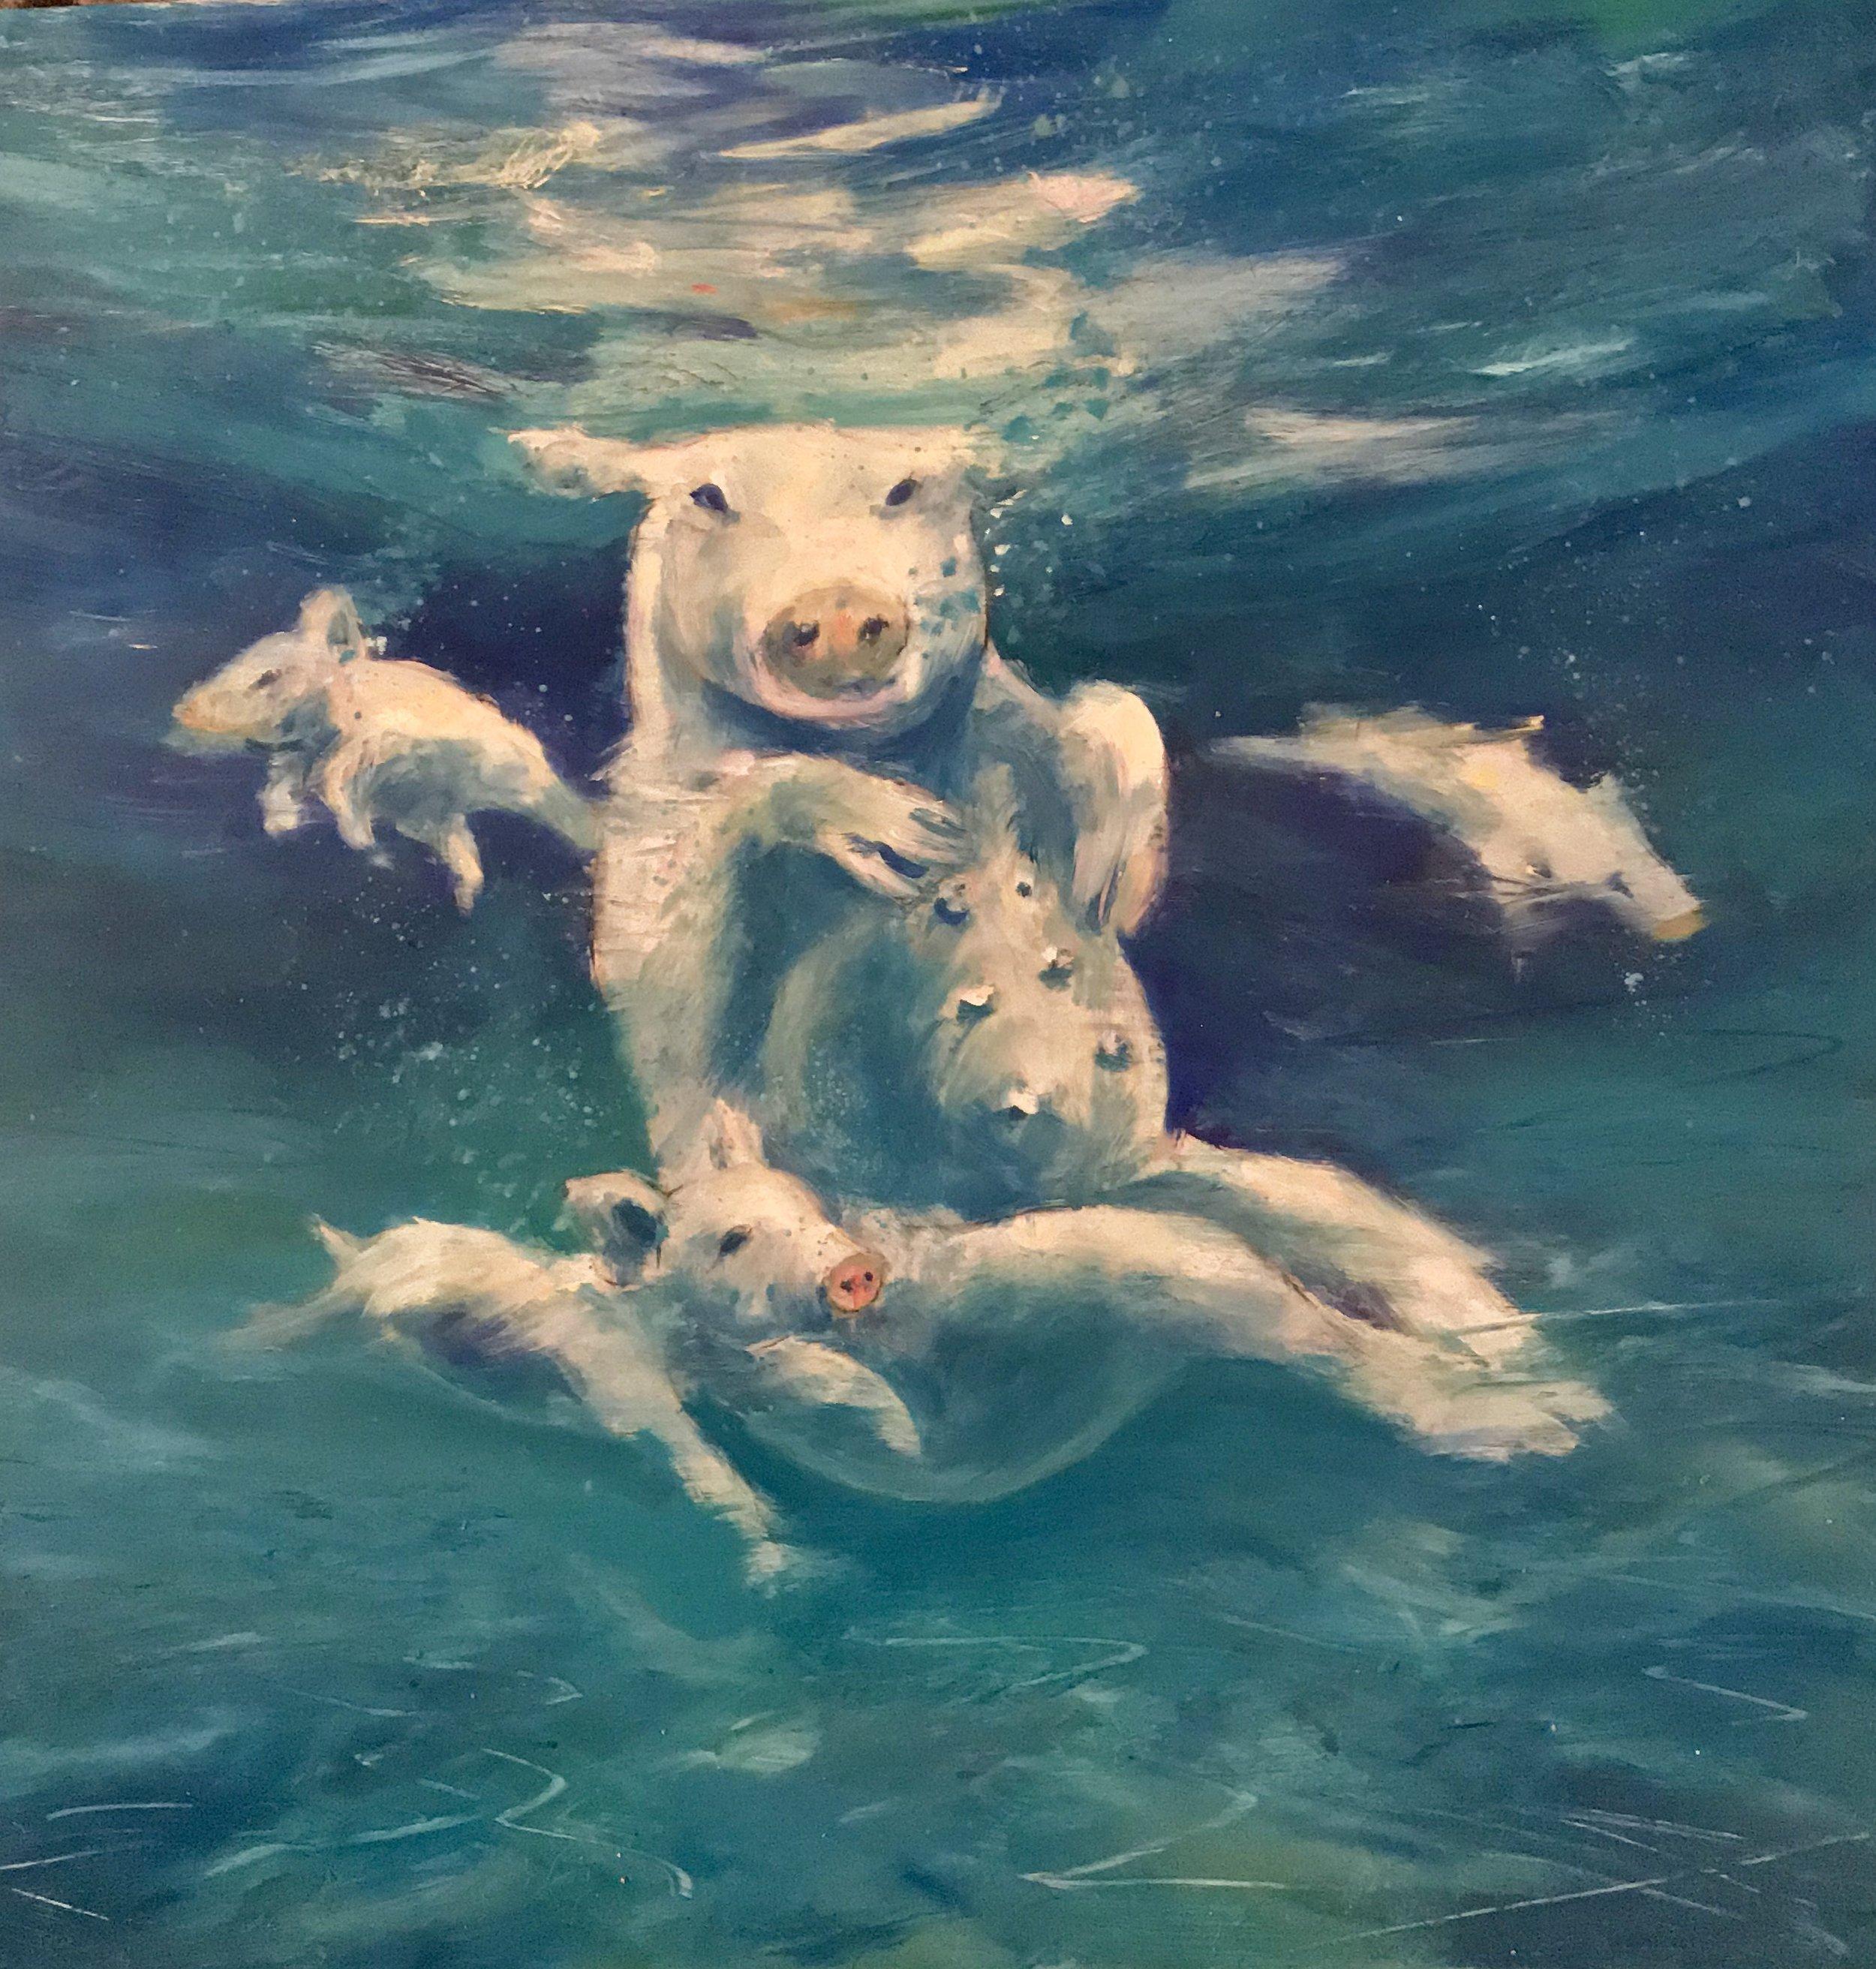 """Saltwater Swines"" Oil on Aluminum (12x12"") 2018"